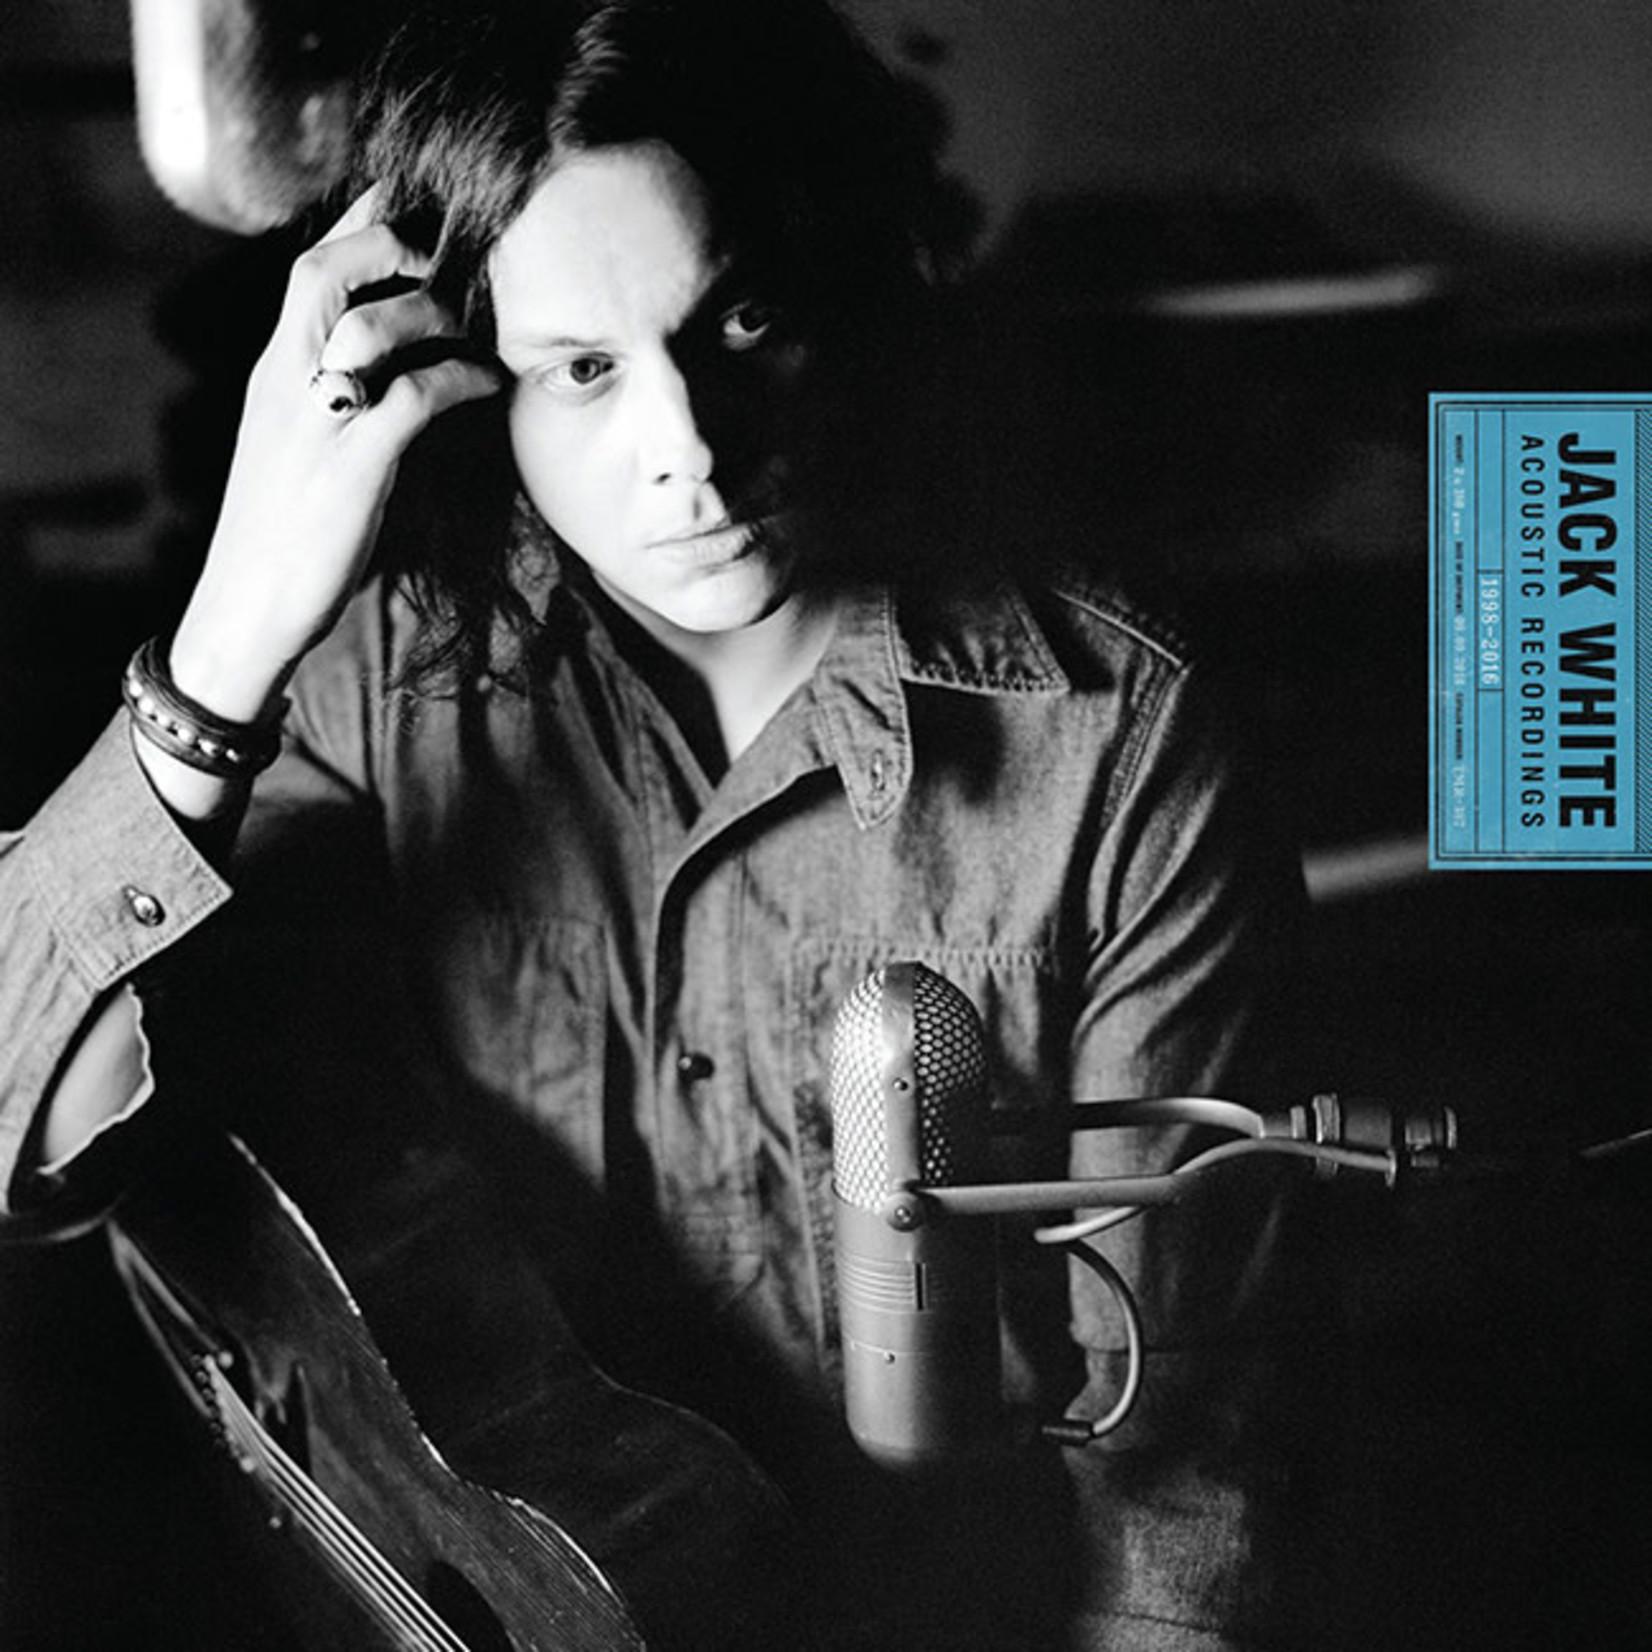 [New] White, Jack (The White Stripes): Jack White Acoustic Recordings 1998 - 2016